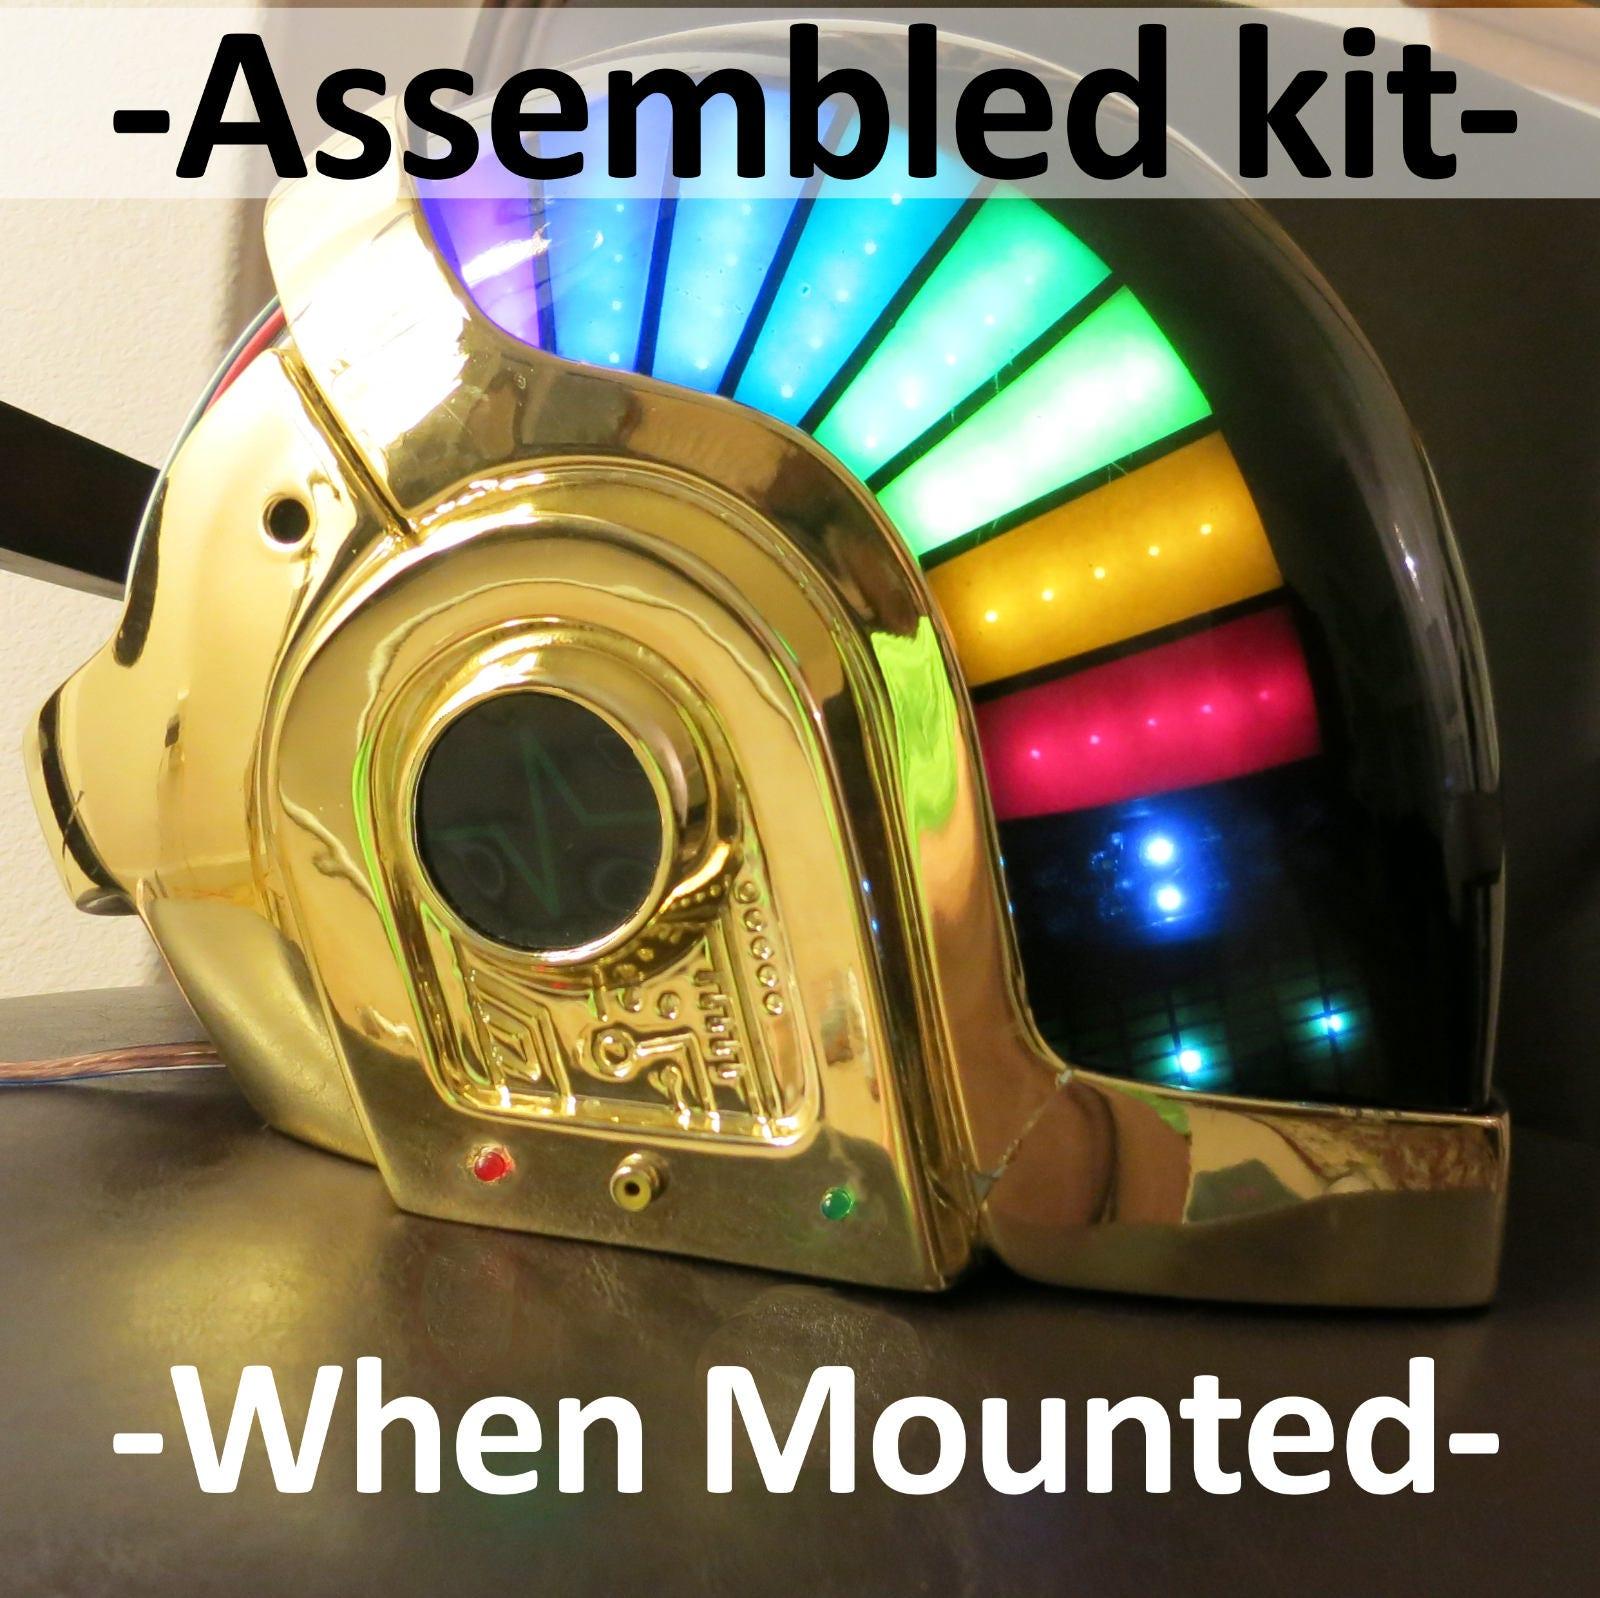 LED kit Guy Manuel Daft Punk for helmet Assembled